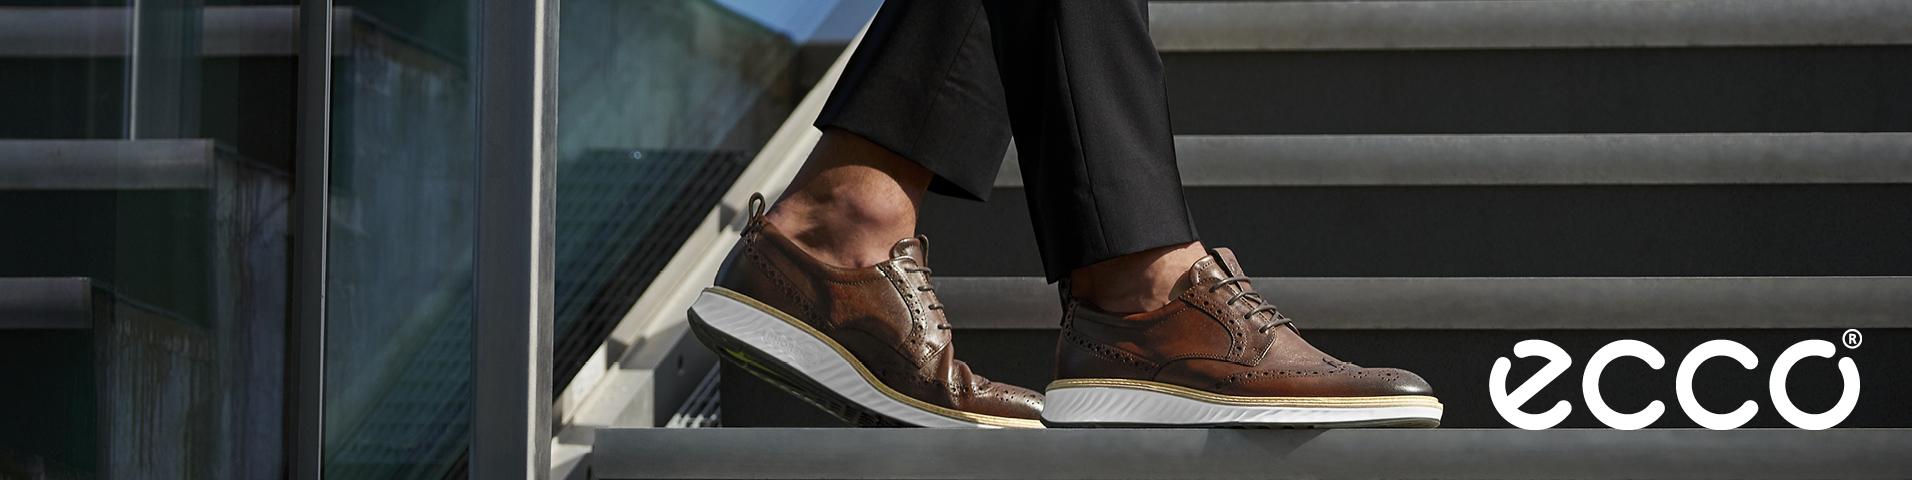 082b6d452 Zapatos ecco de hombre online